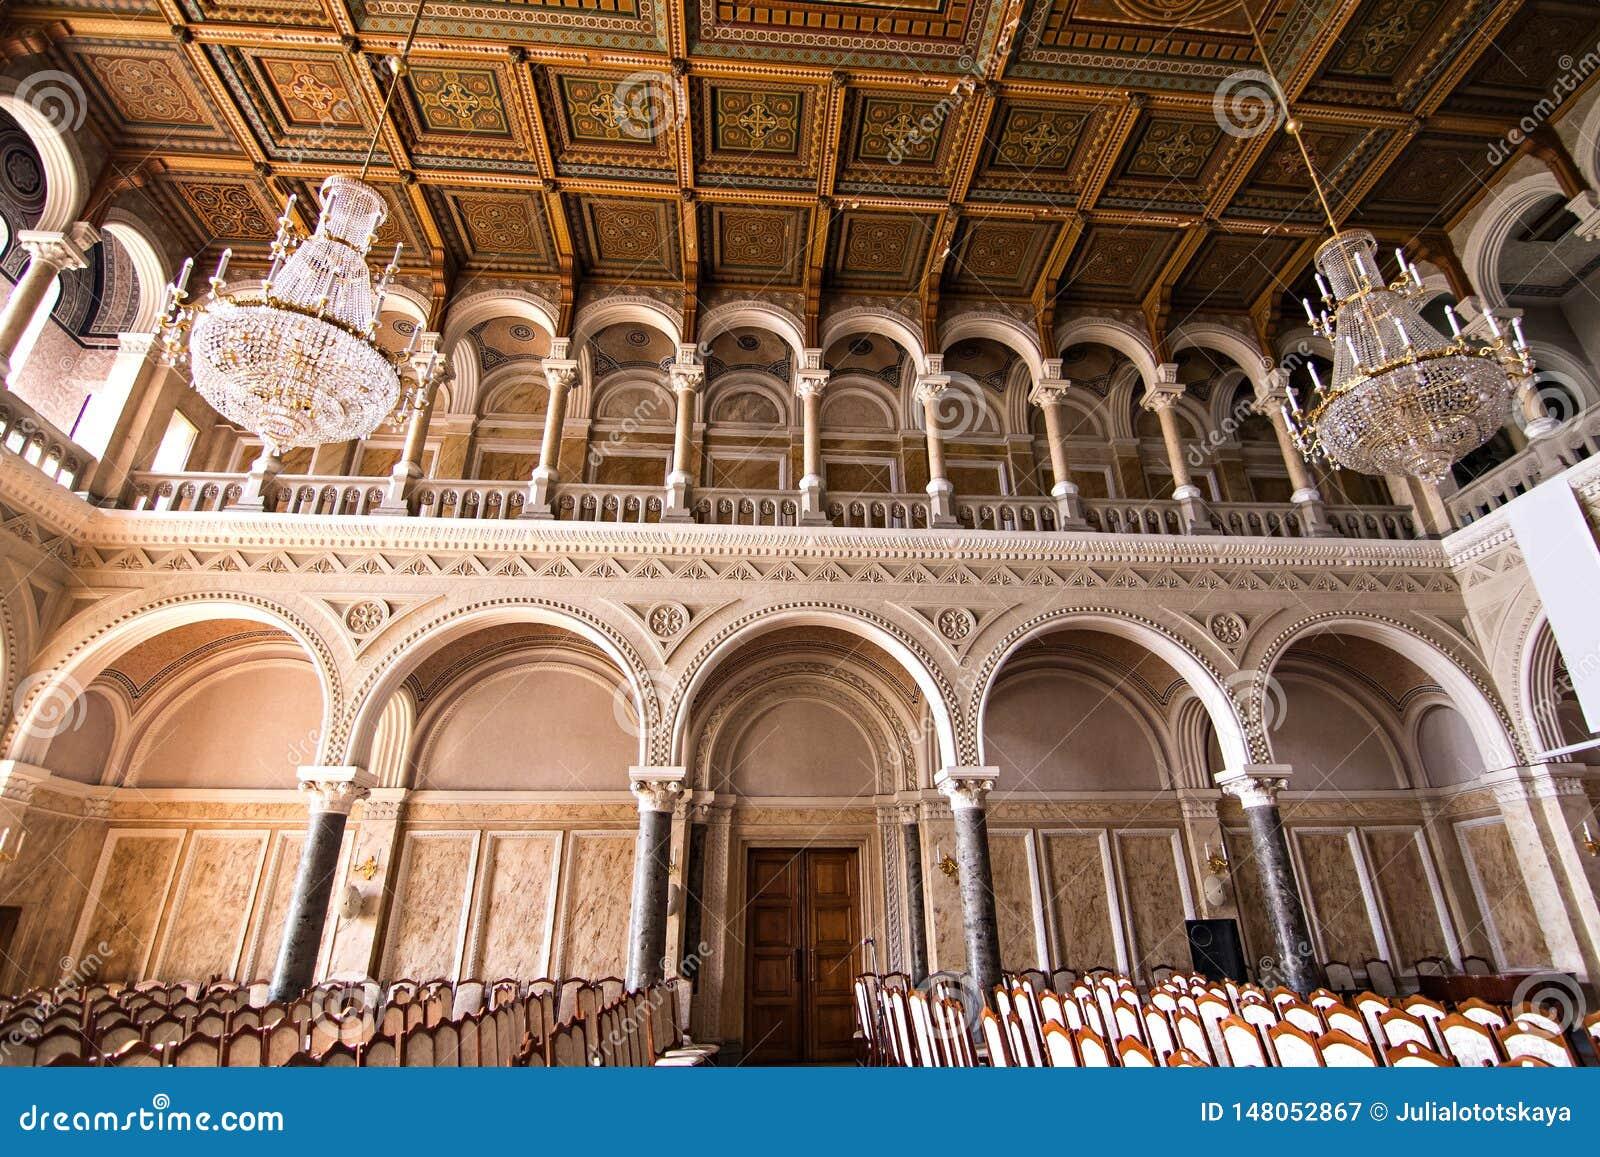 Inre korridorer i h?rlig historisk byggnad av det Chernivtsi medborgareuniversitetet